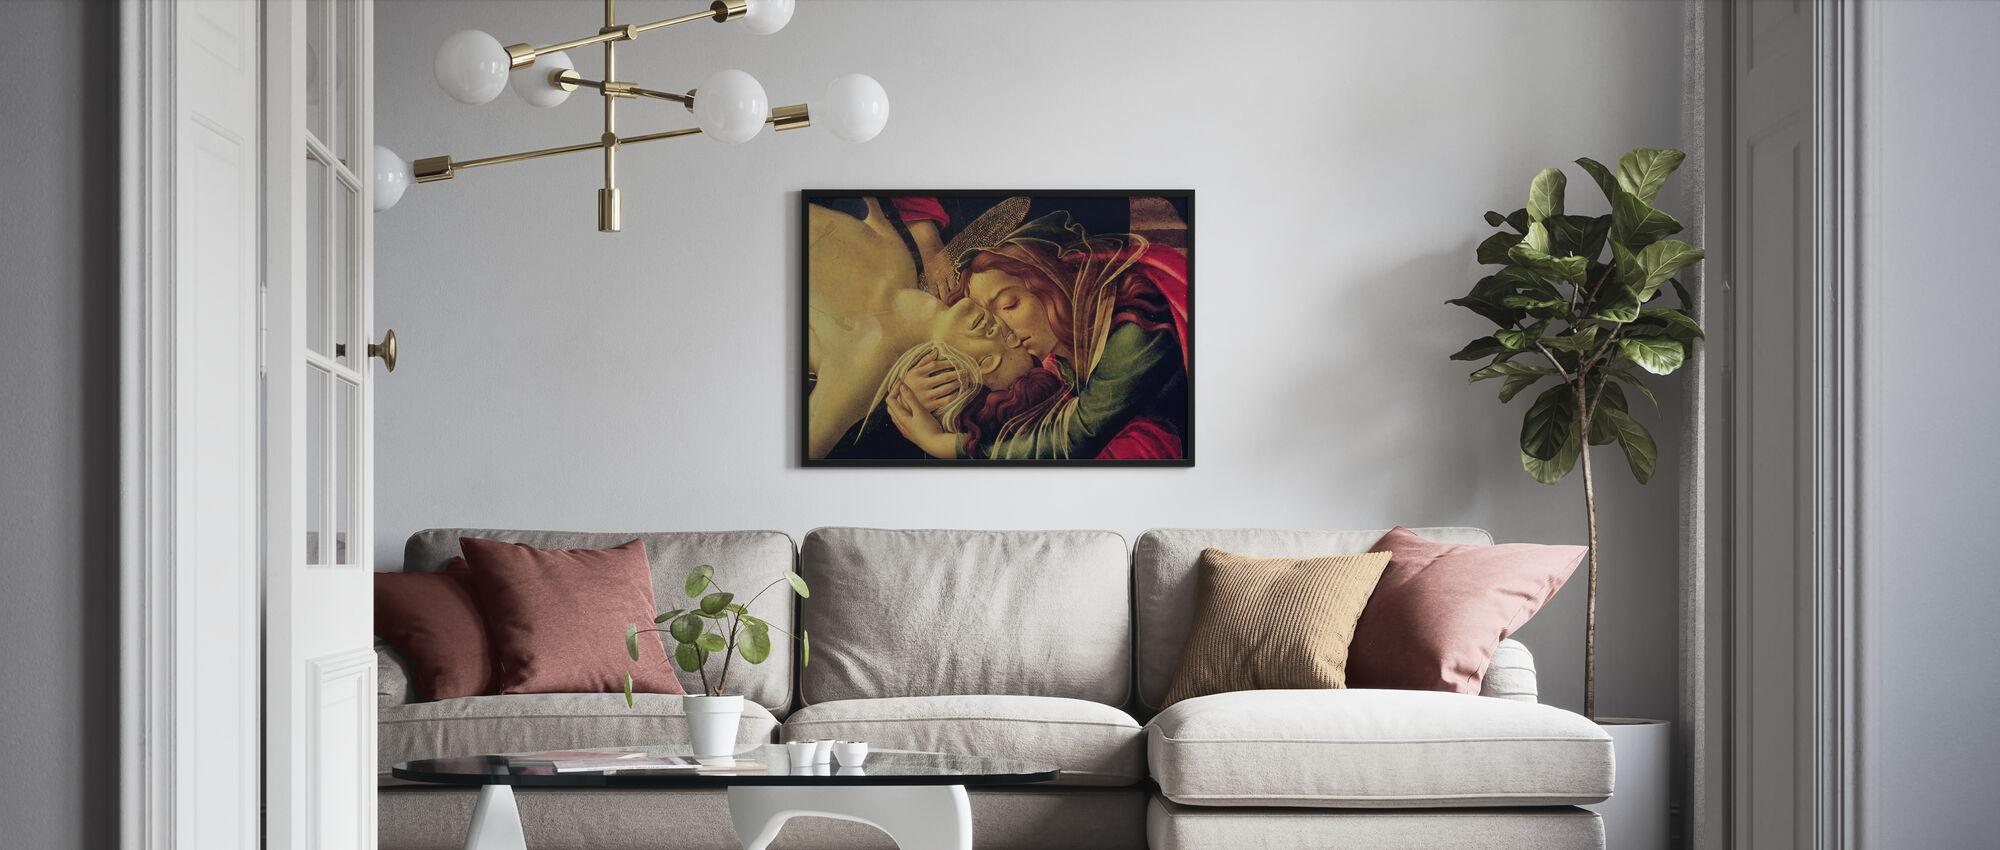 Klaagzang van Christus - Sandro Botticelli - Poster - Woonkamer